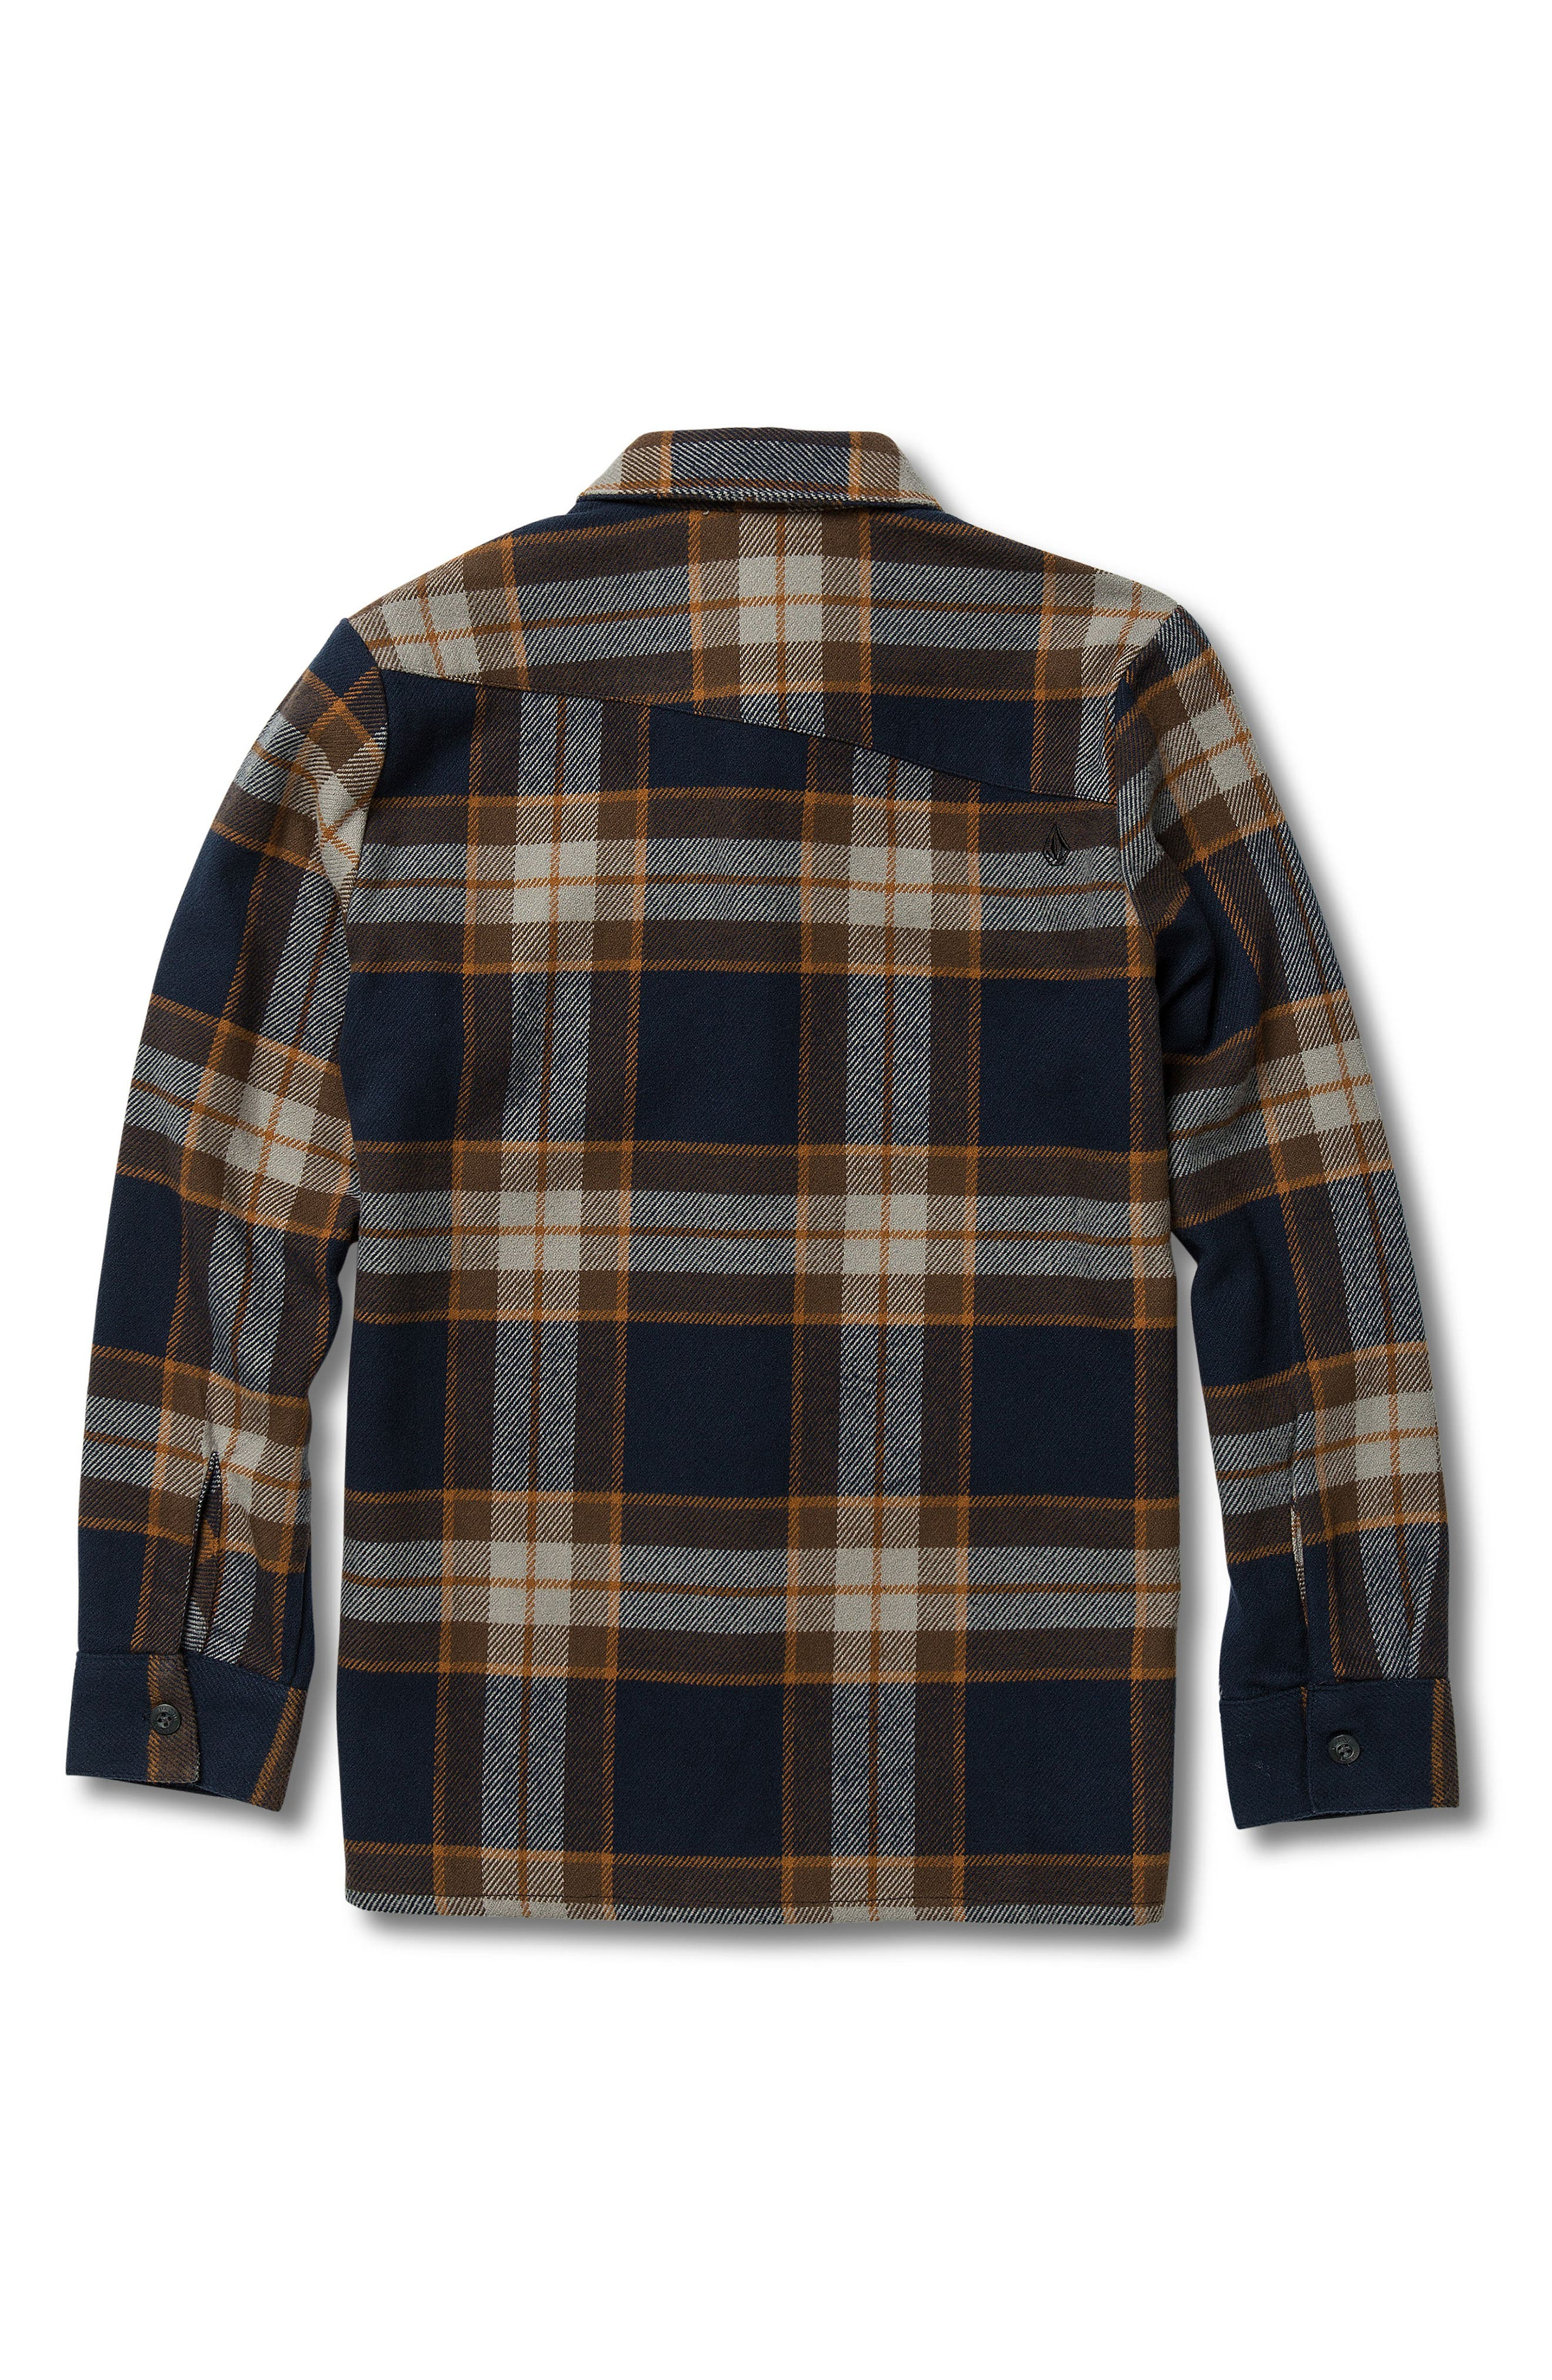 VOLCOM,                             Randower Plaid Flannel Shirt,                             Alternate thumbnail 2, color,                             MELINDIGO